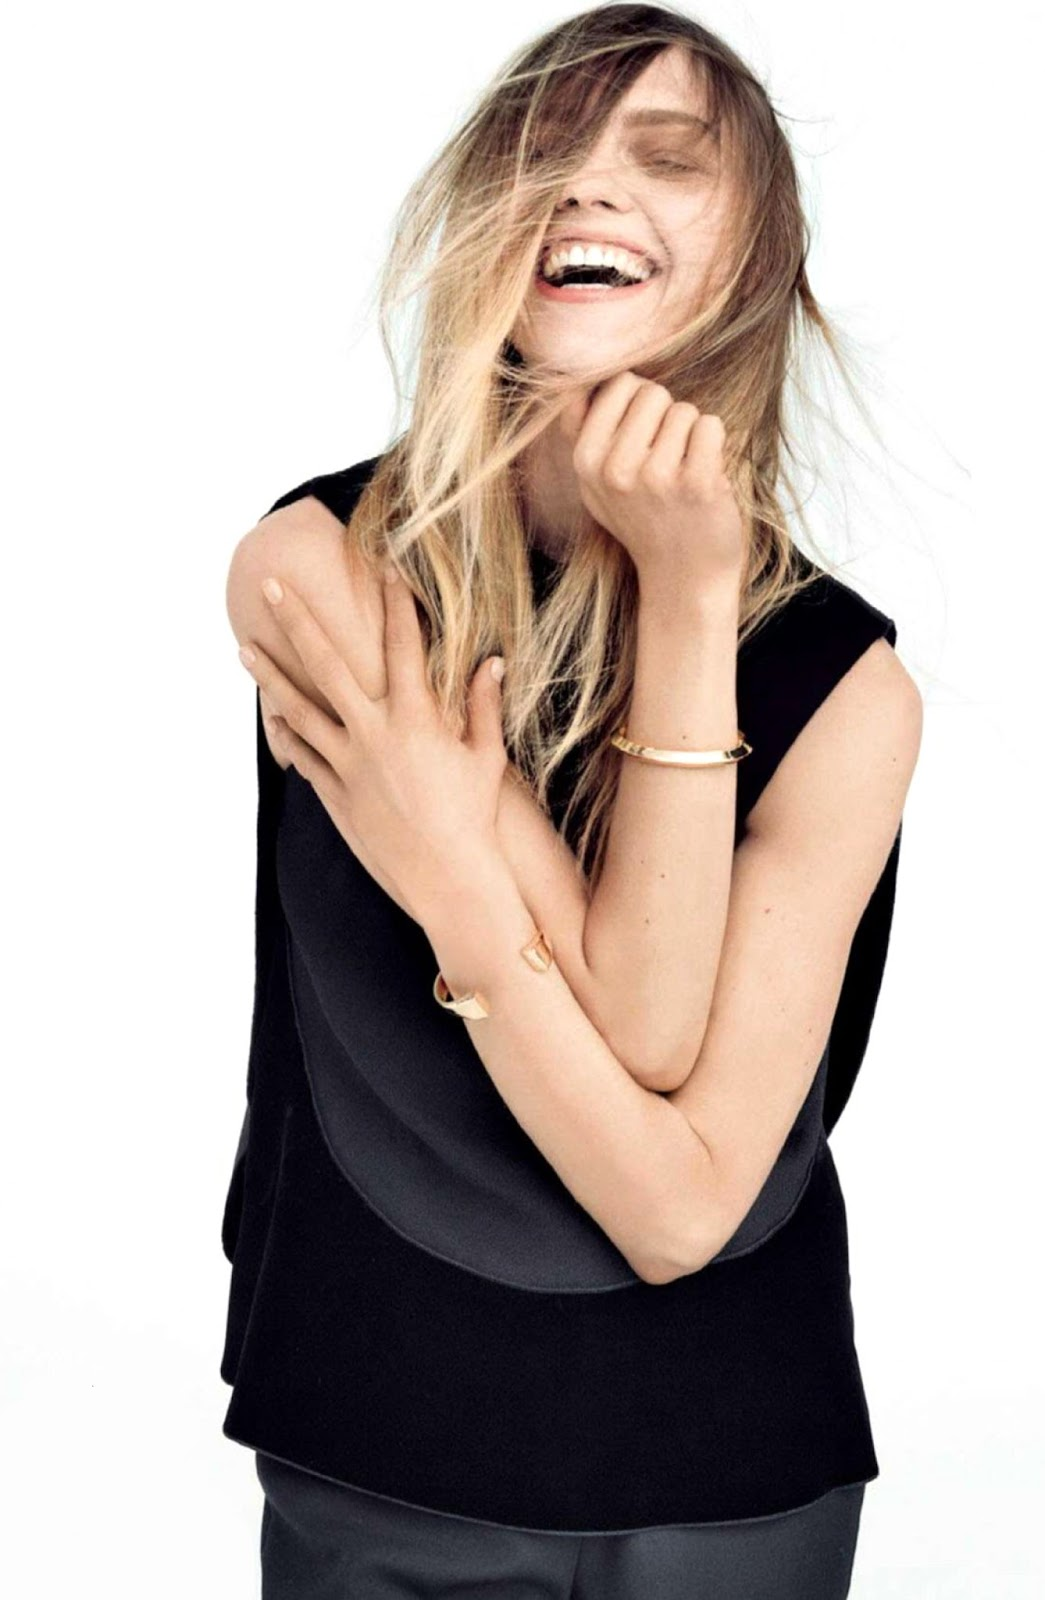 best of designer sales under £100 / Sasha Pivovarova in Vogue UK July 2014 (photography: Daniel Jackson, styling: Kate Phelan)